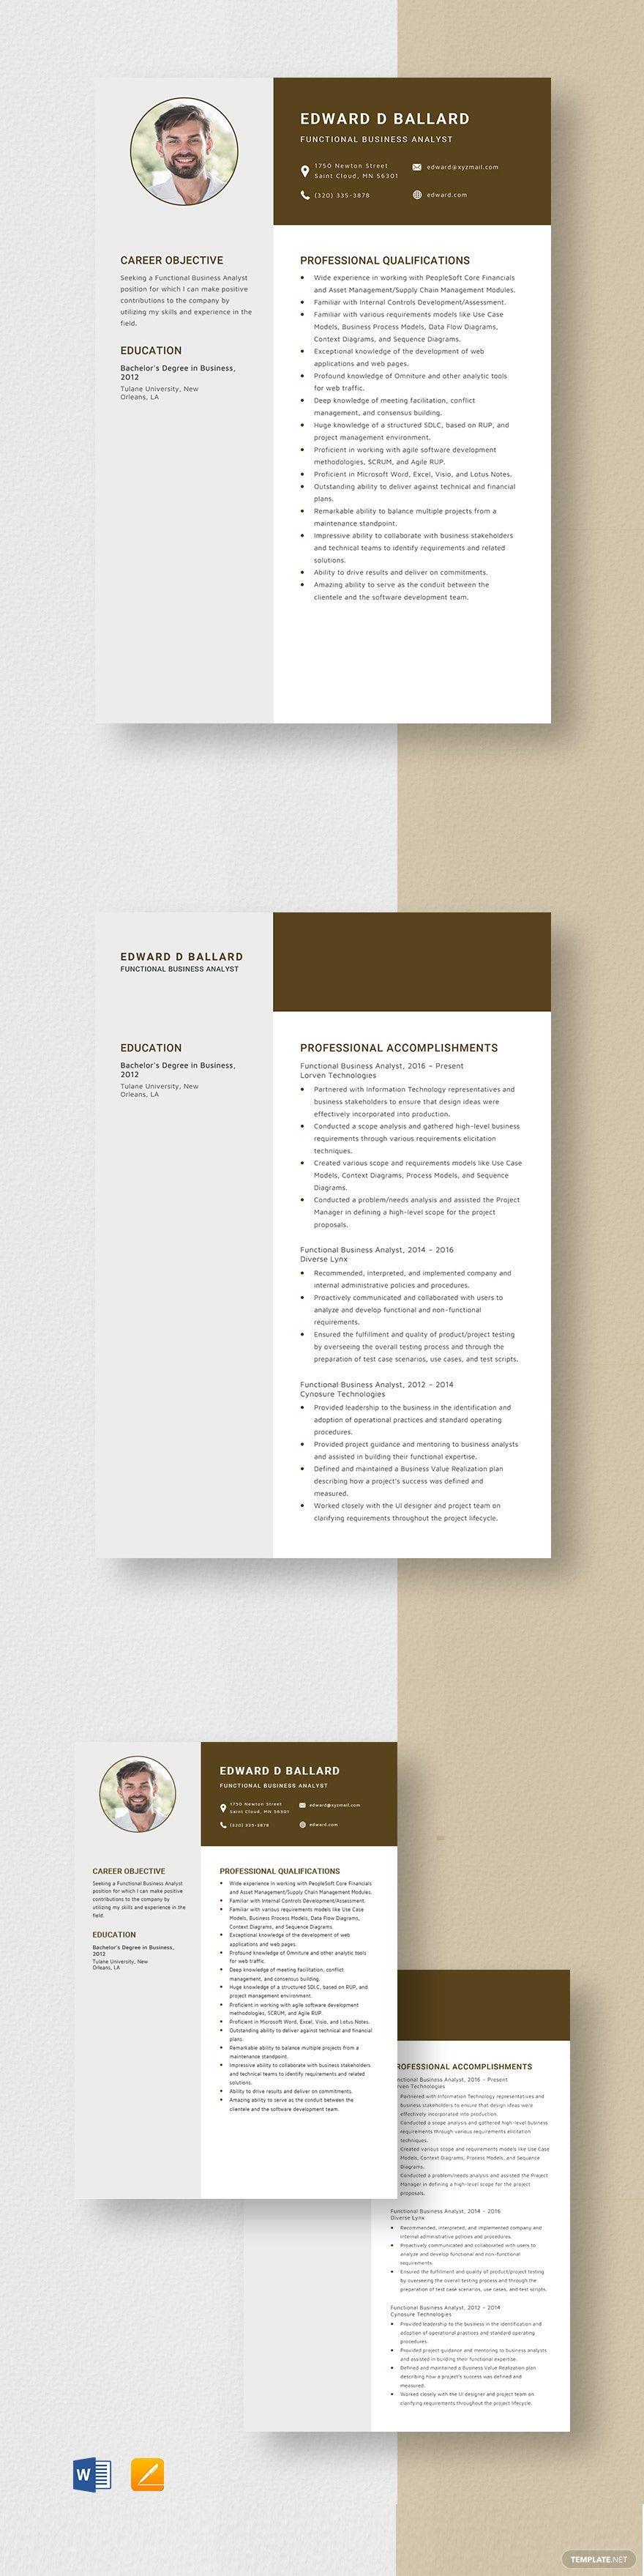 Modern resume template microsoft word free Resume